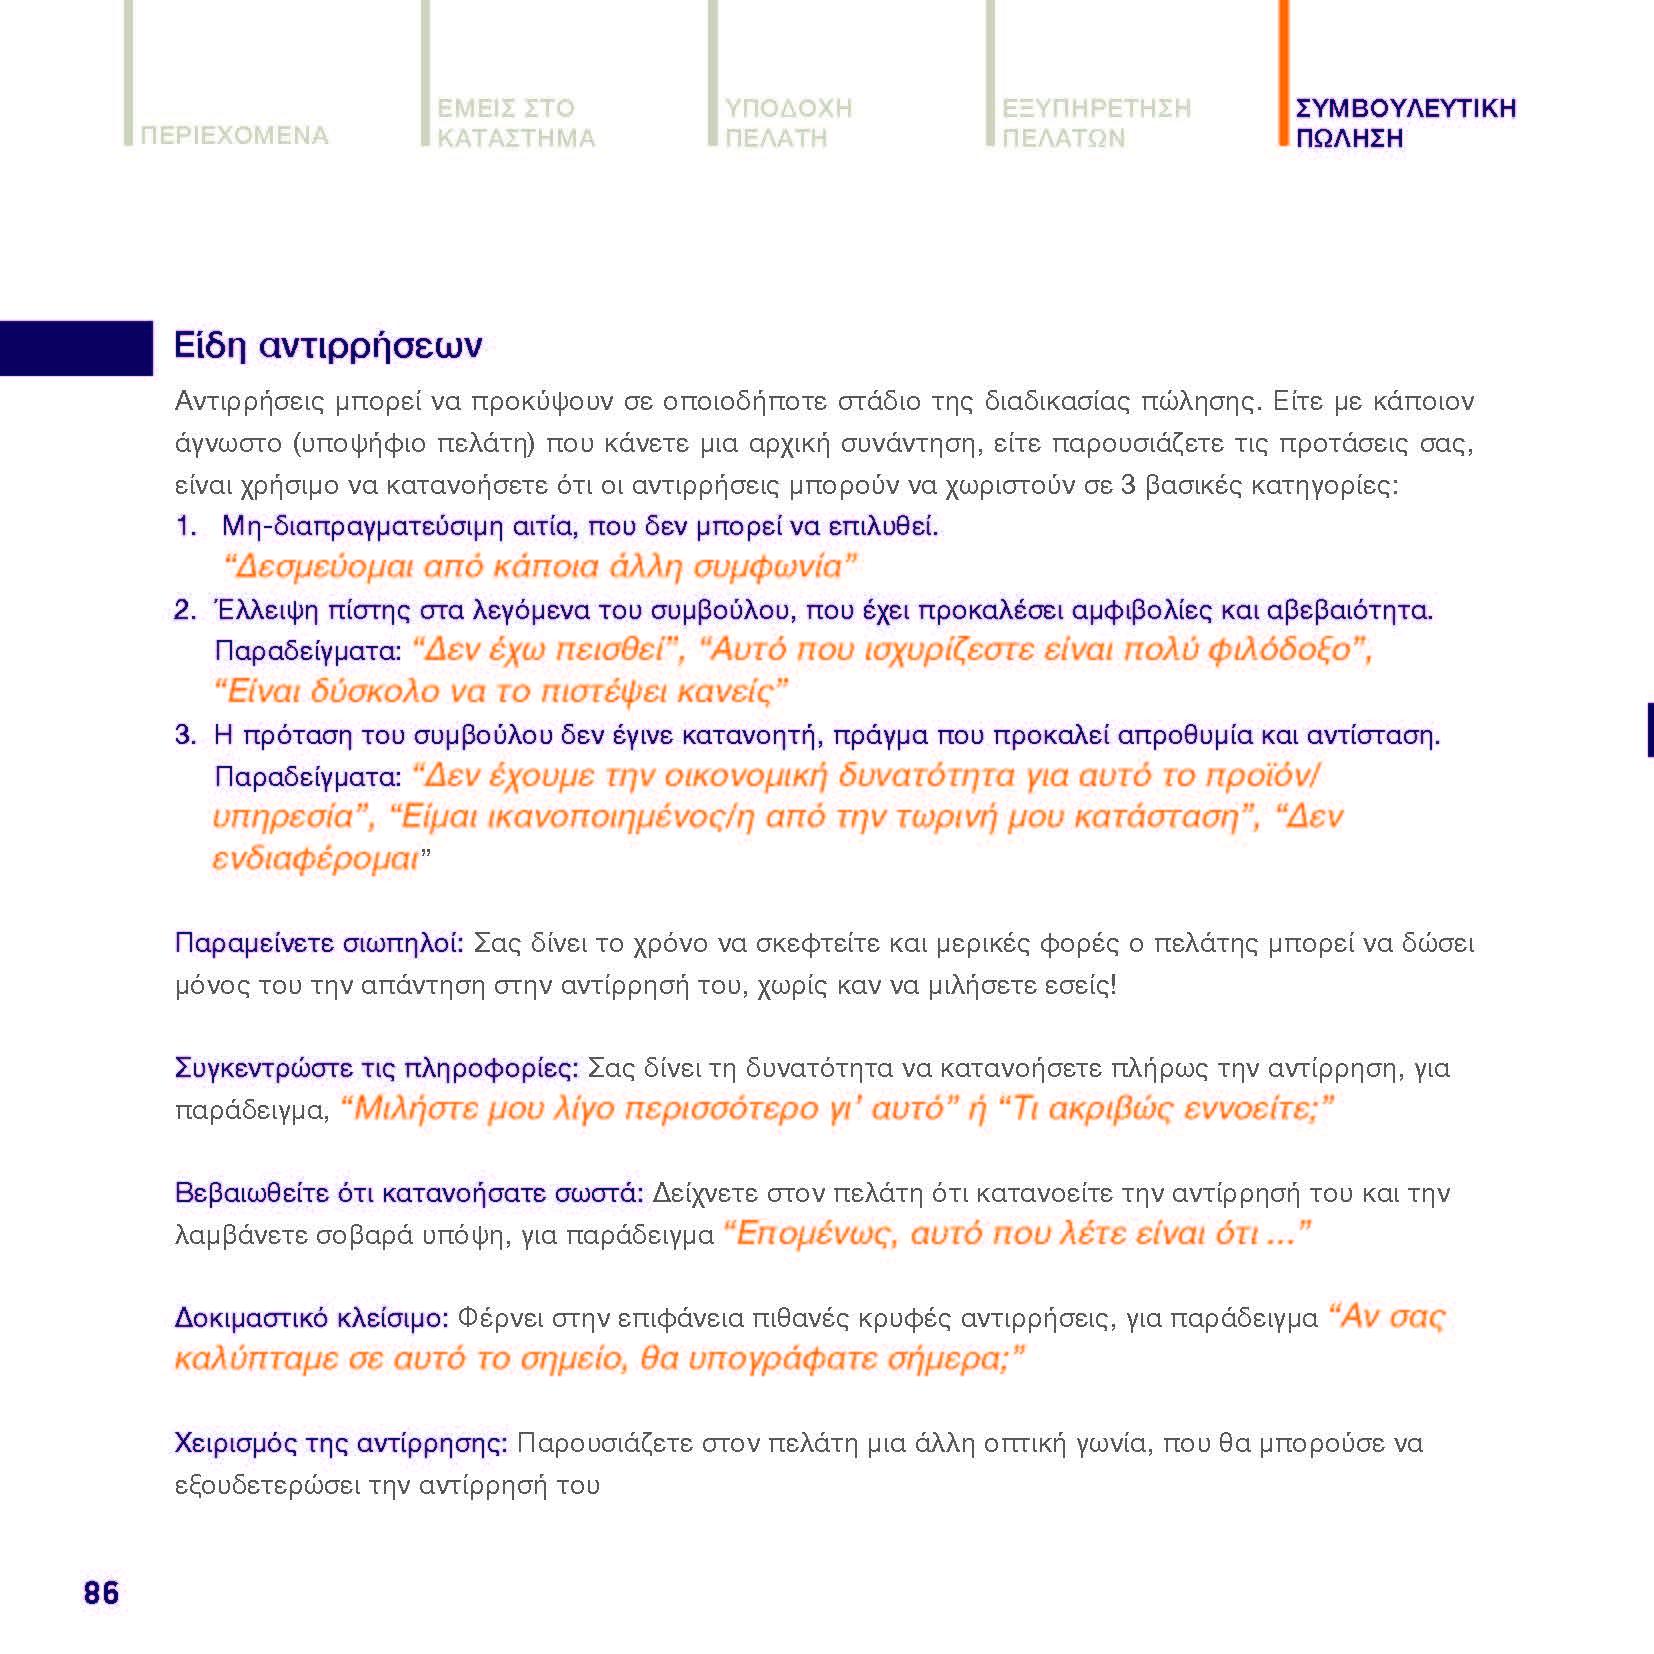 https://www.jib.gr/wp-content/uploads/2020/09/OPTIMA-BANK-BOOKLET-WEB_Page_086.jpg